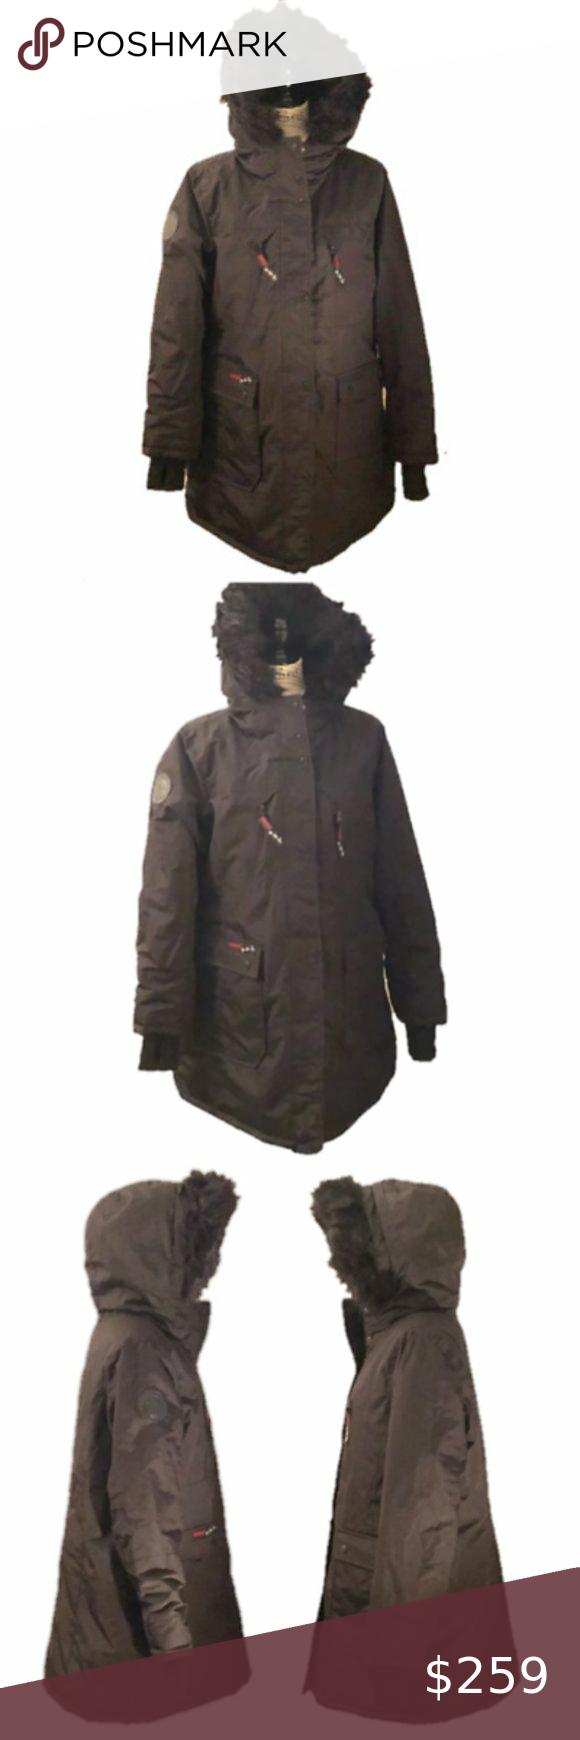 Canada Weather Gear Xl 12 14 Black Winter Coat Black Winter Coat Winter Coat Winter Jacket North Face [ 1740 x 580 Pixel ]